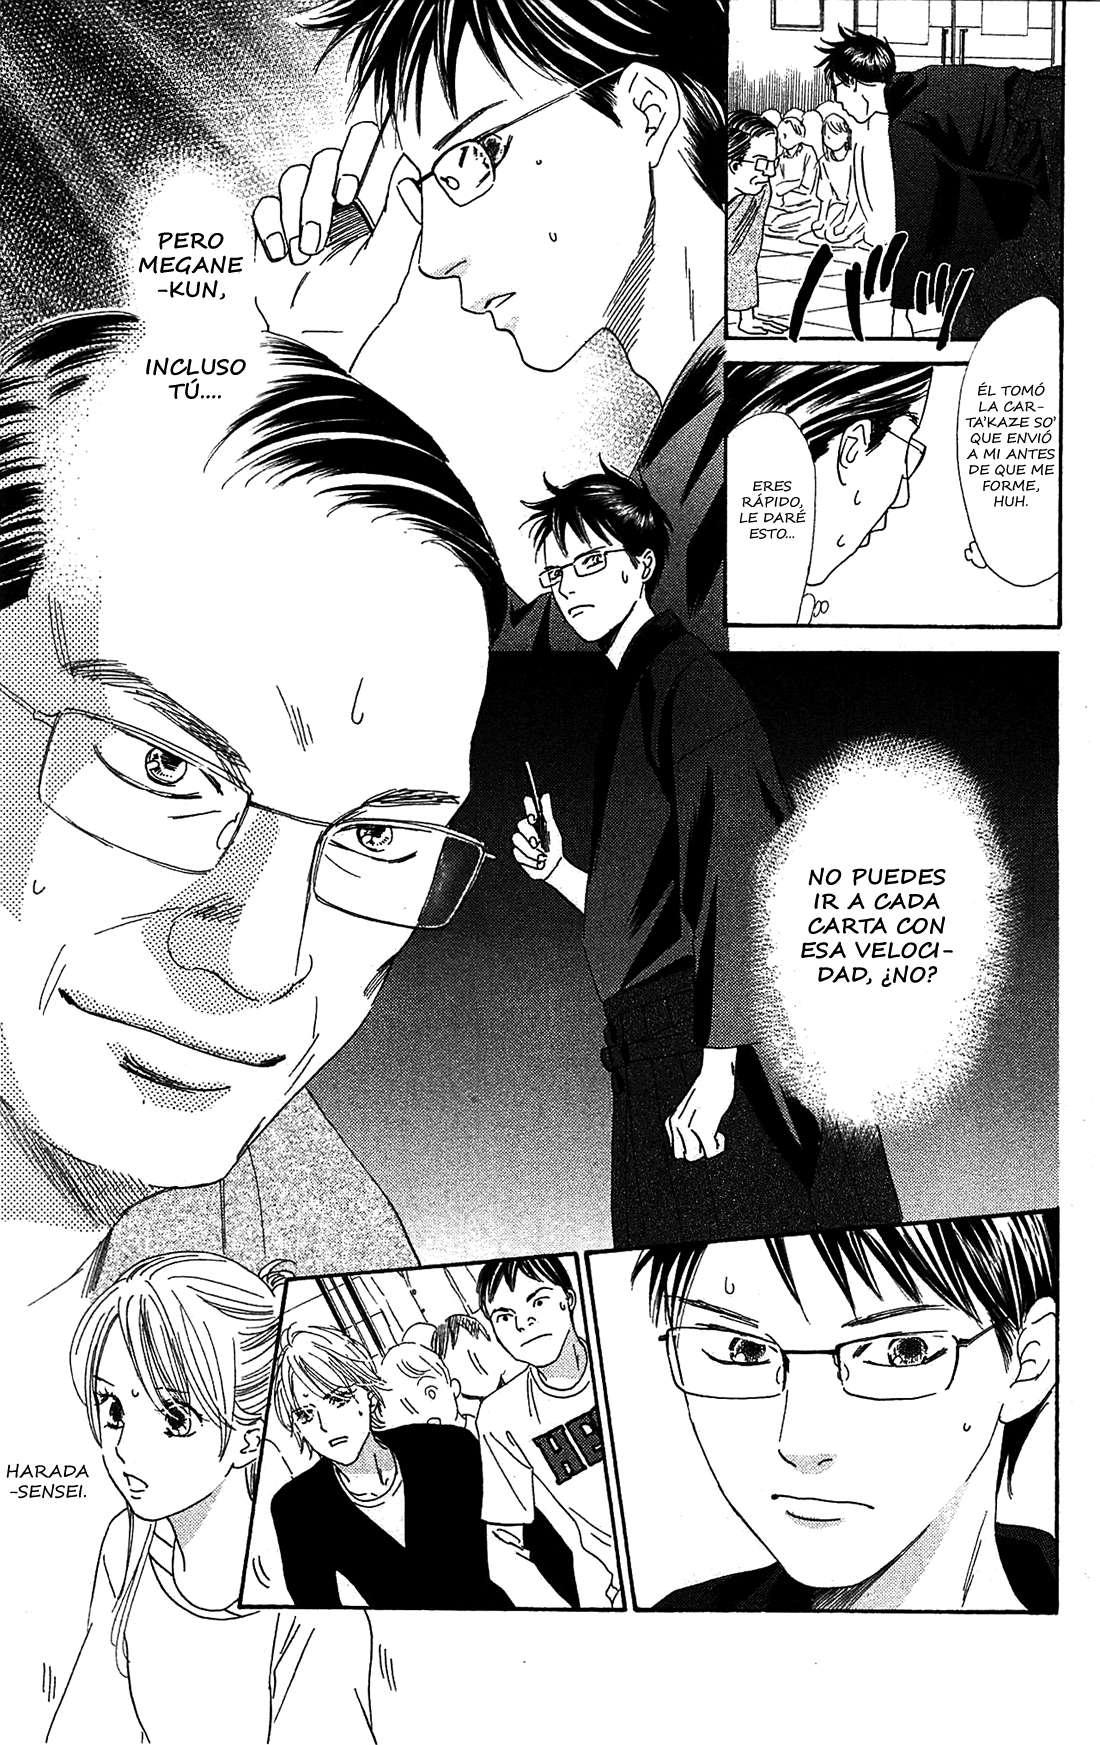 https://c5.ninemanga.com/es_manga/32/1824/398206/53a65197918e28a61e45b2e5b4e100fc.jpg Page 22